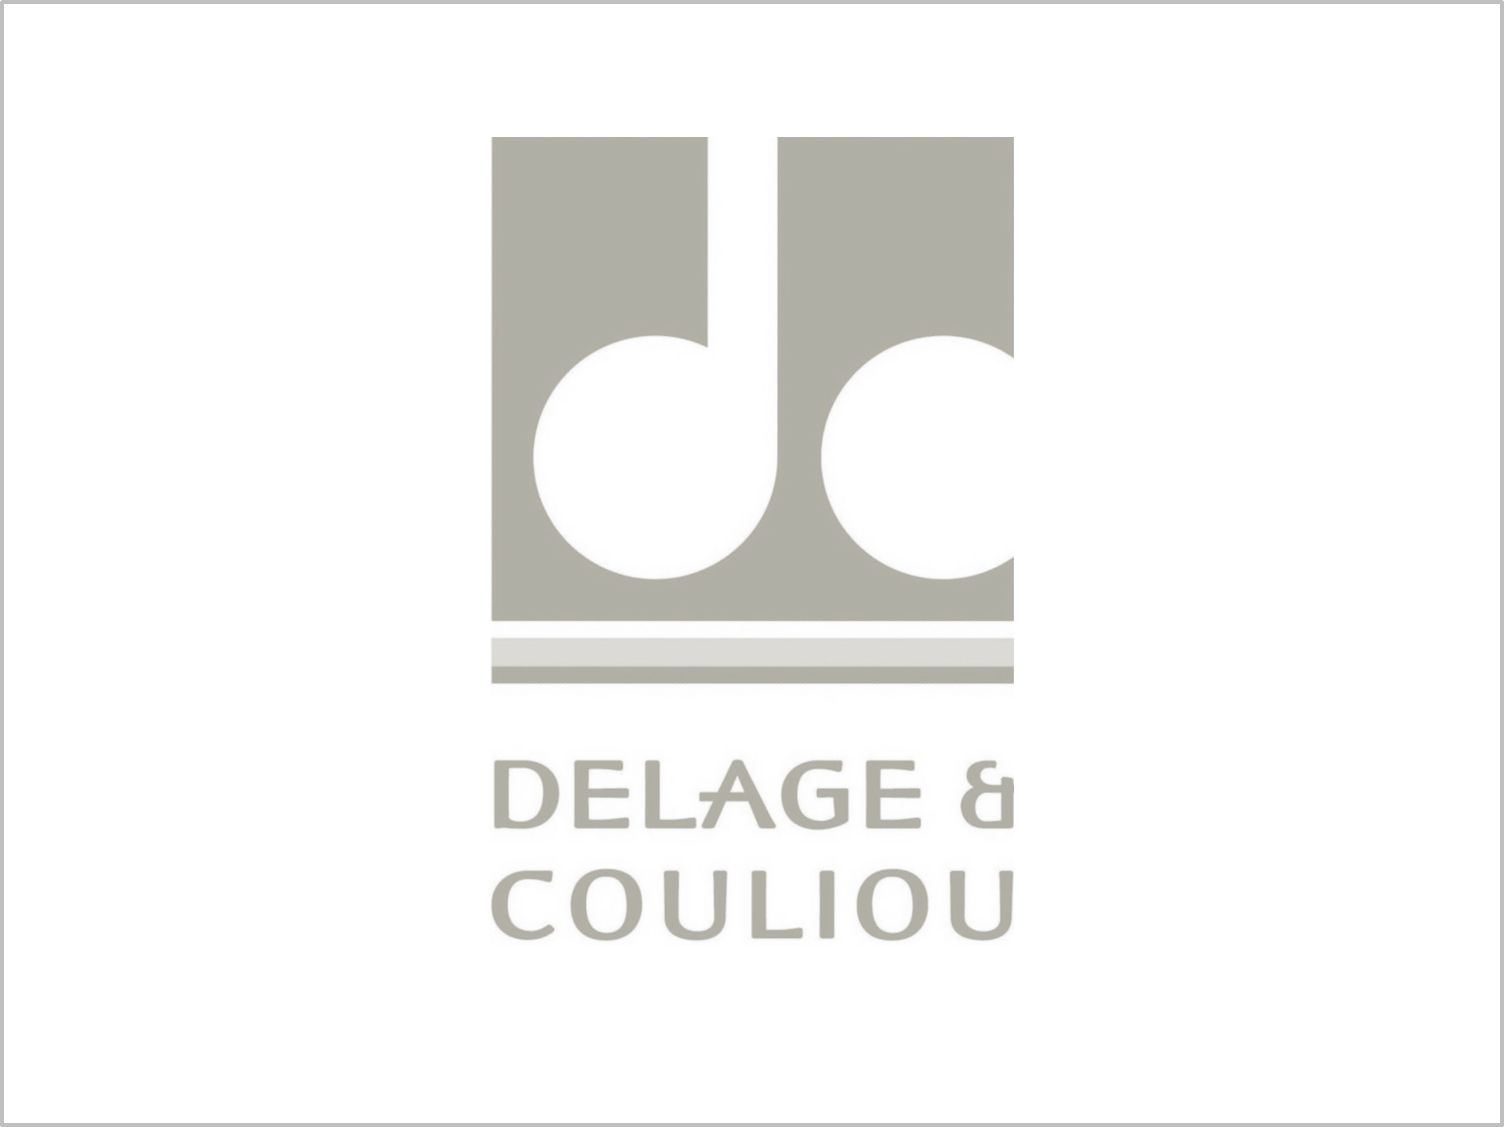 Reference delage et couliou